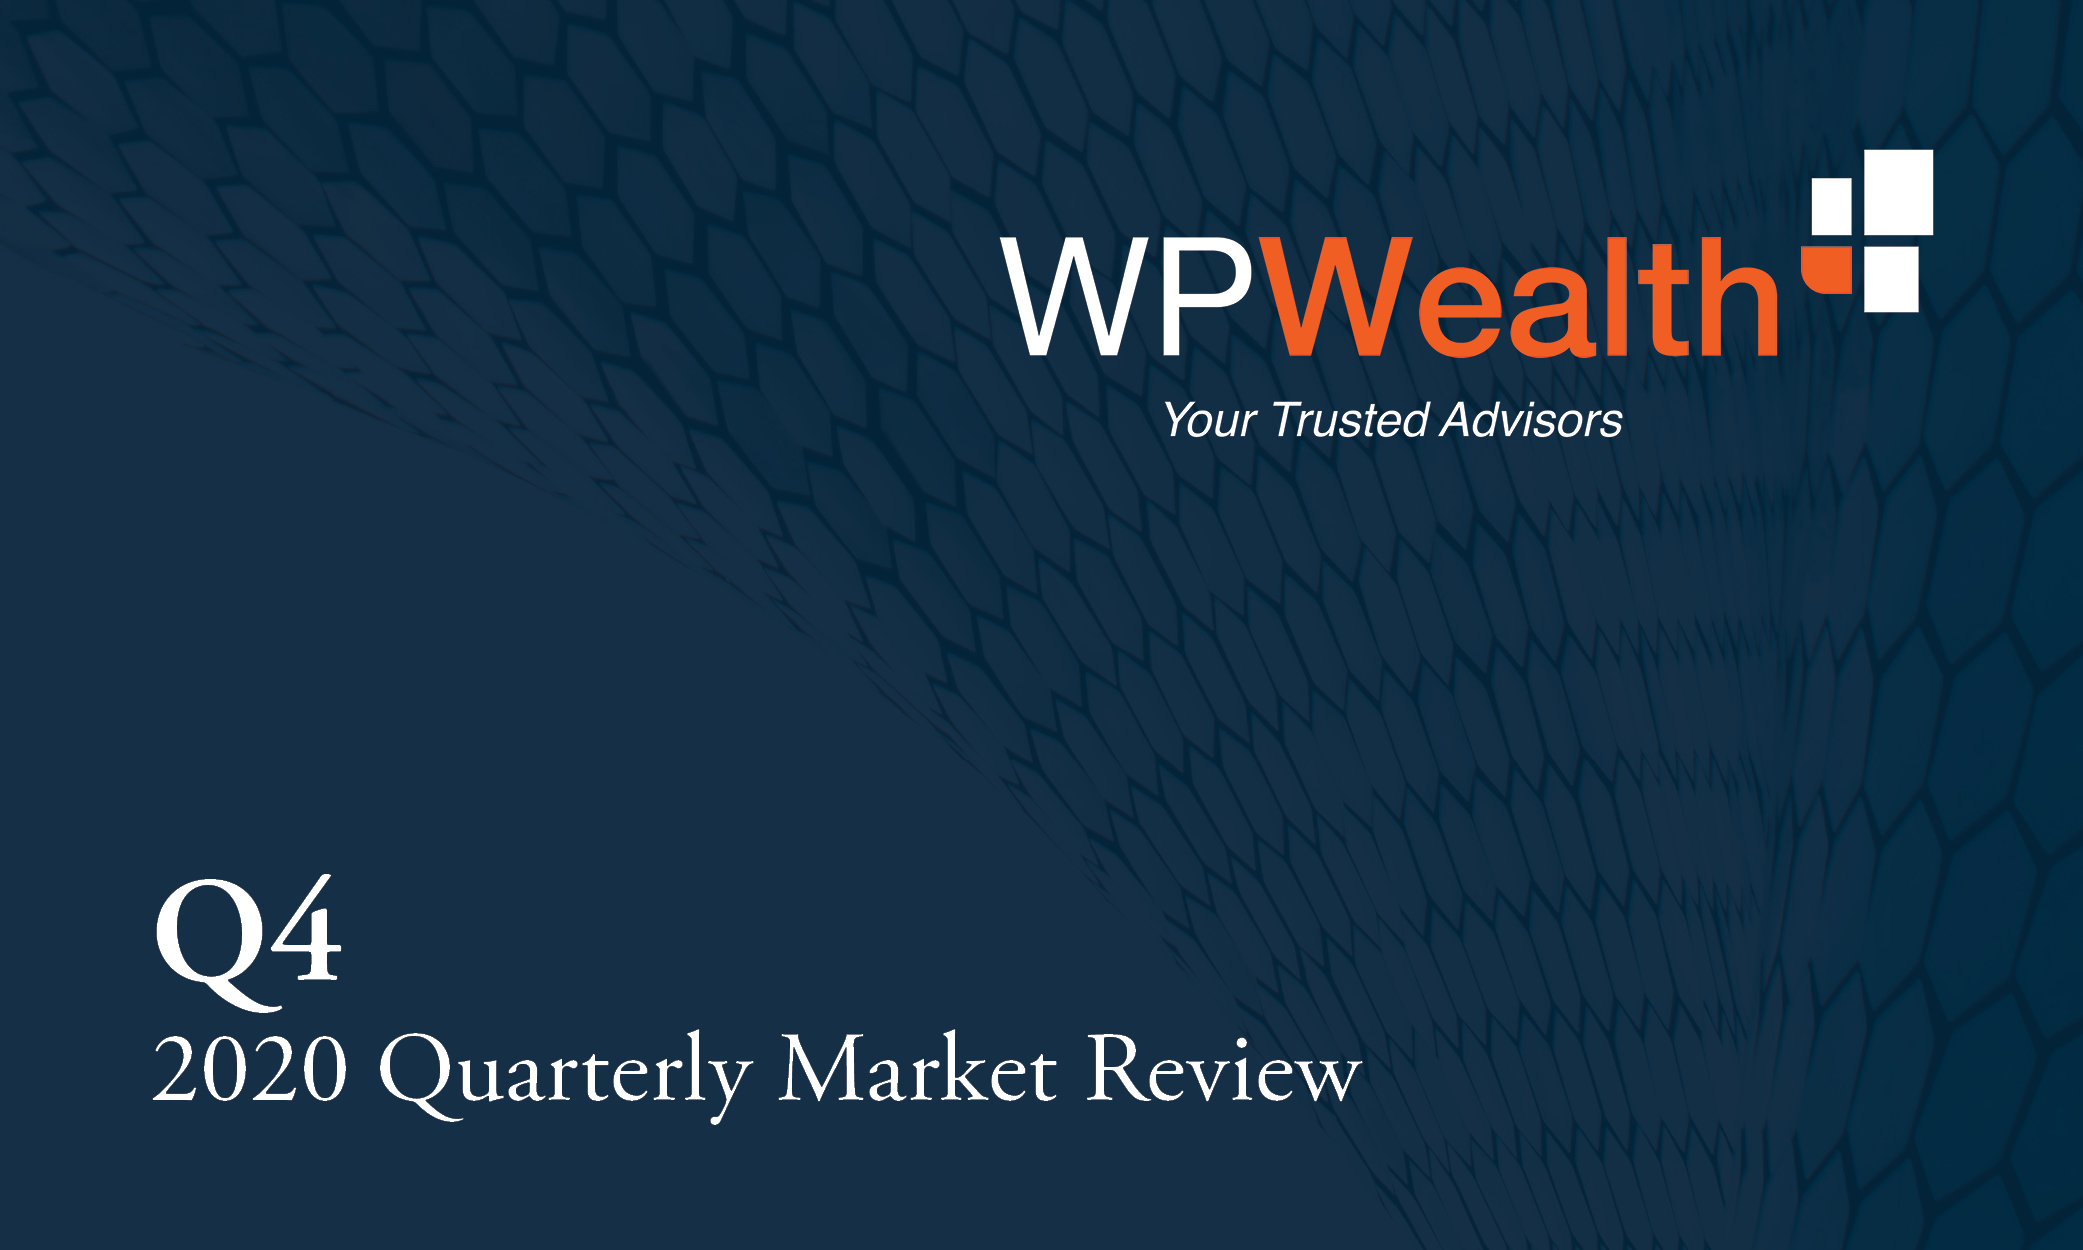 WPWealth Quarterly Market Review Q4 2020